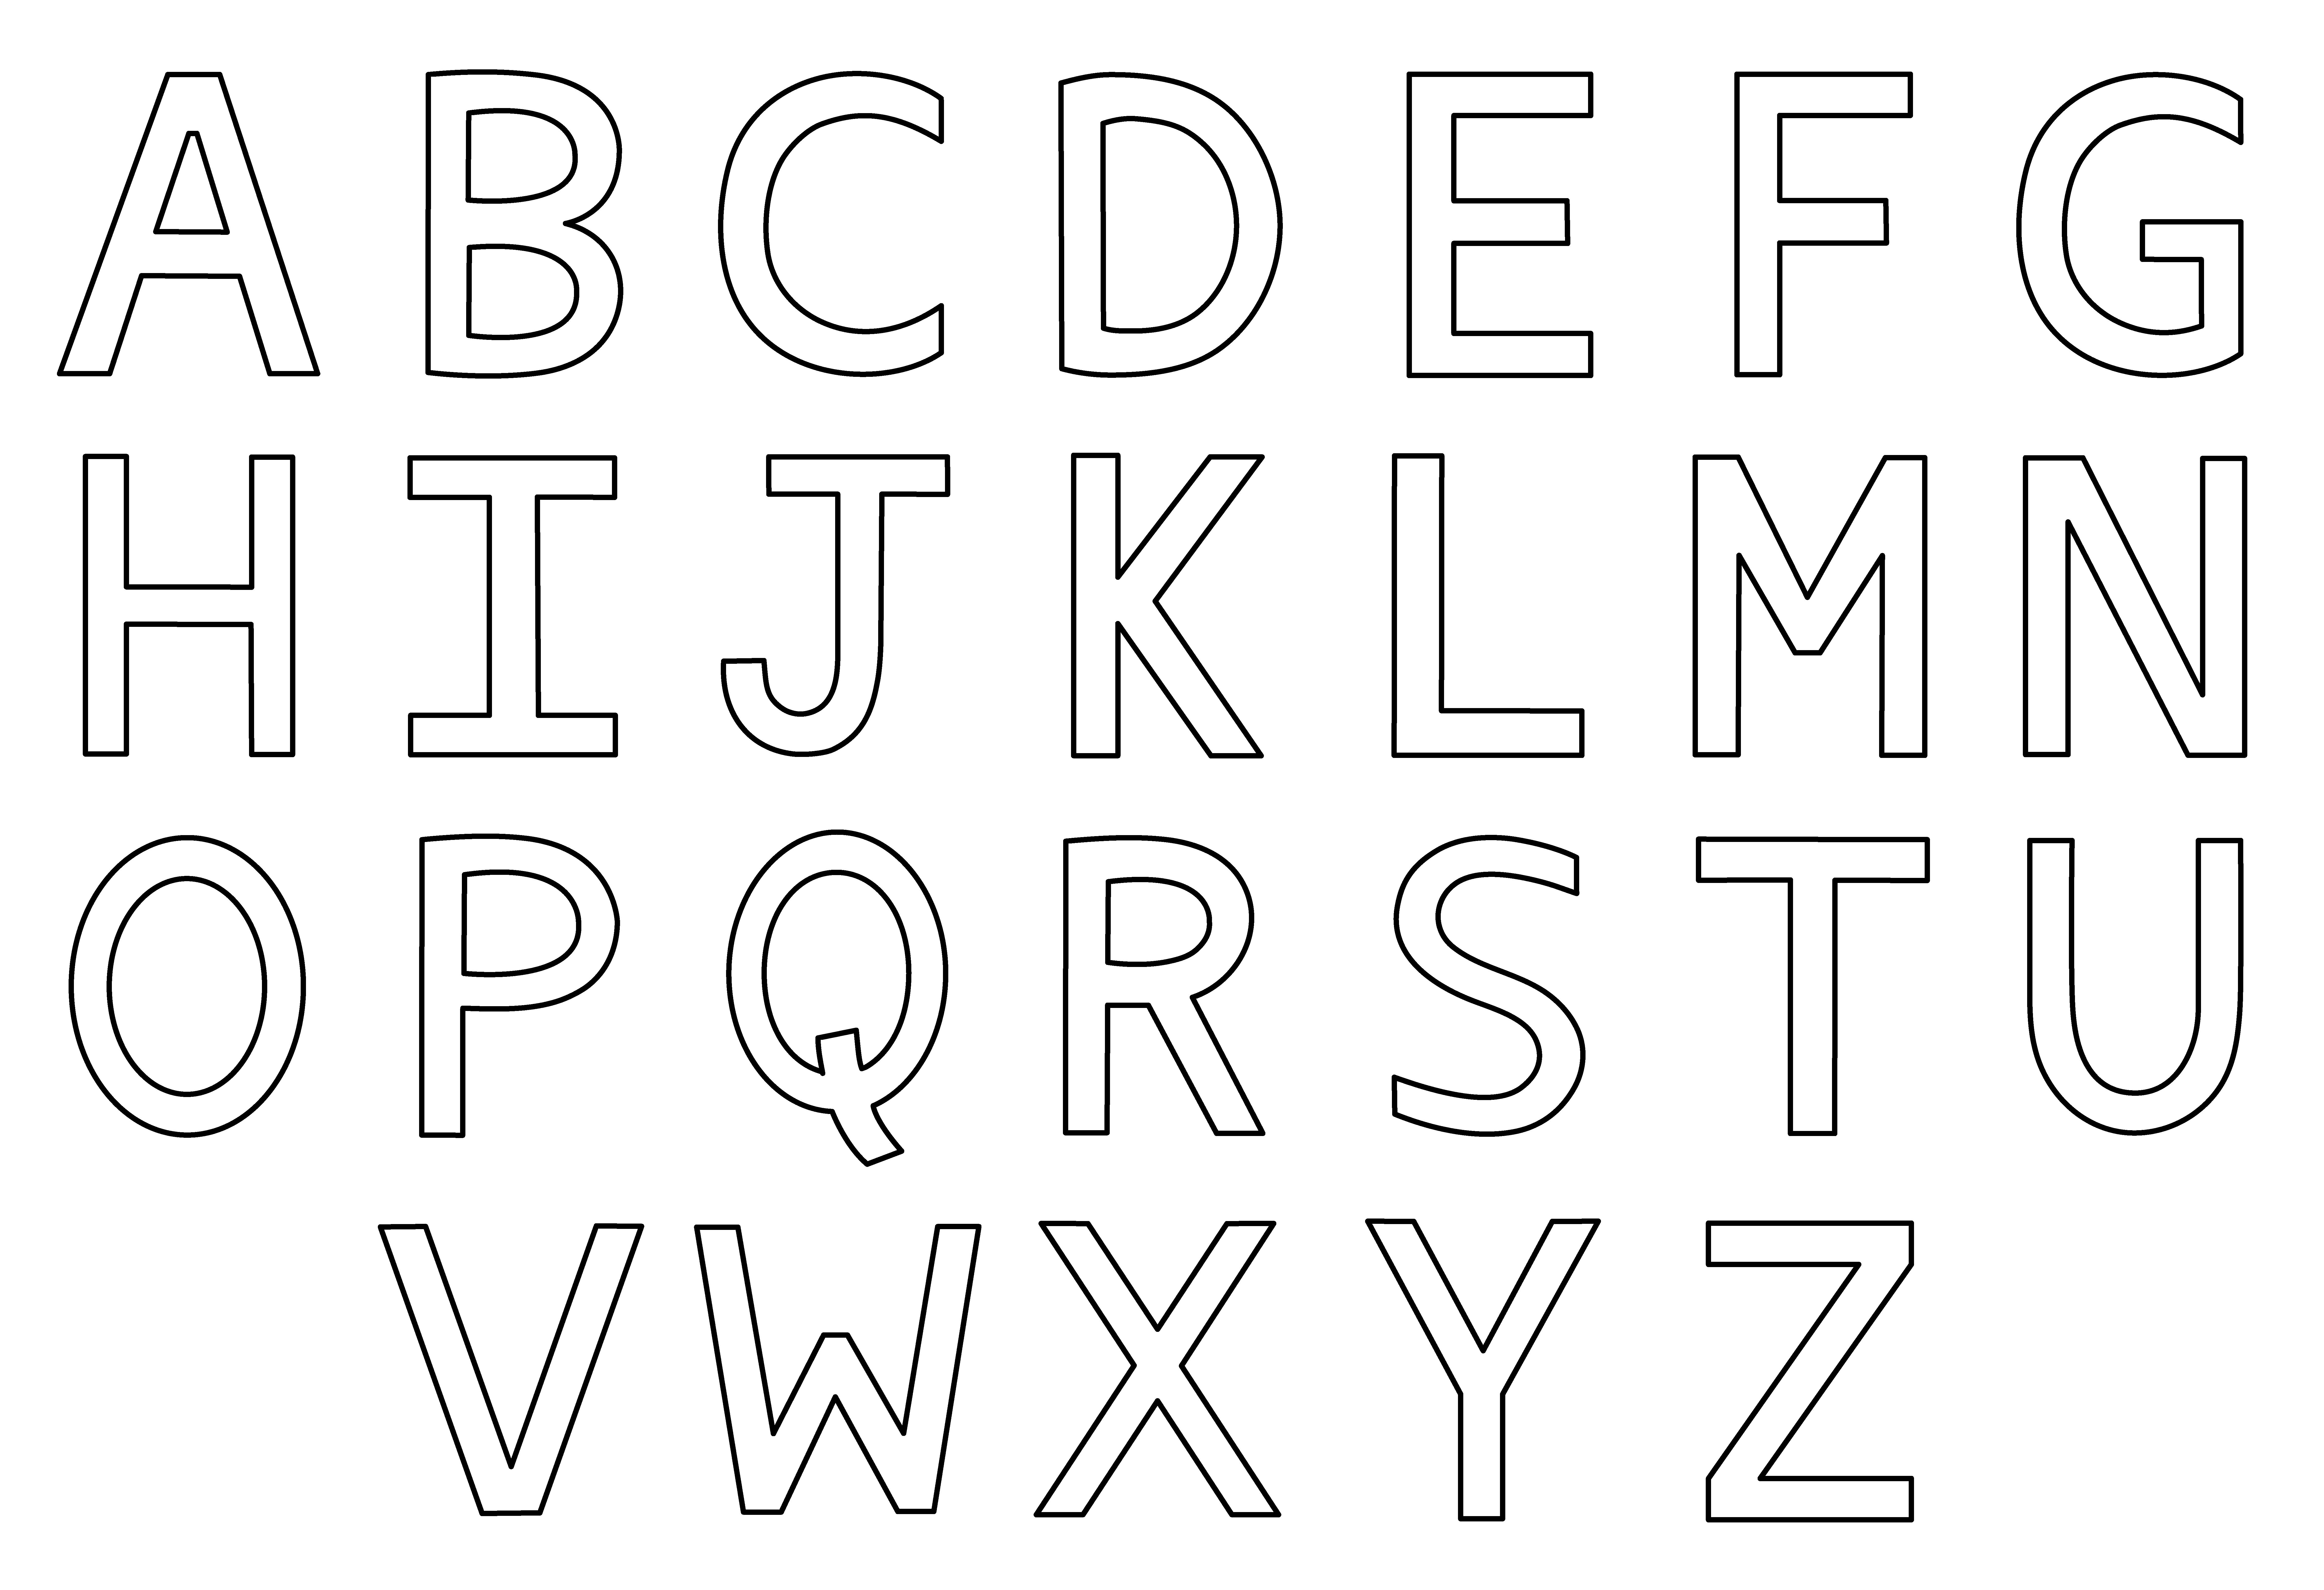 coloring pages alphabet free whole alphabet coloring pages free printable coloring home pages free coloring alphabet